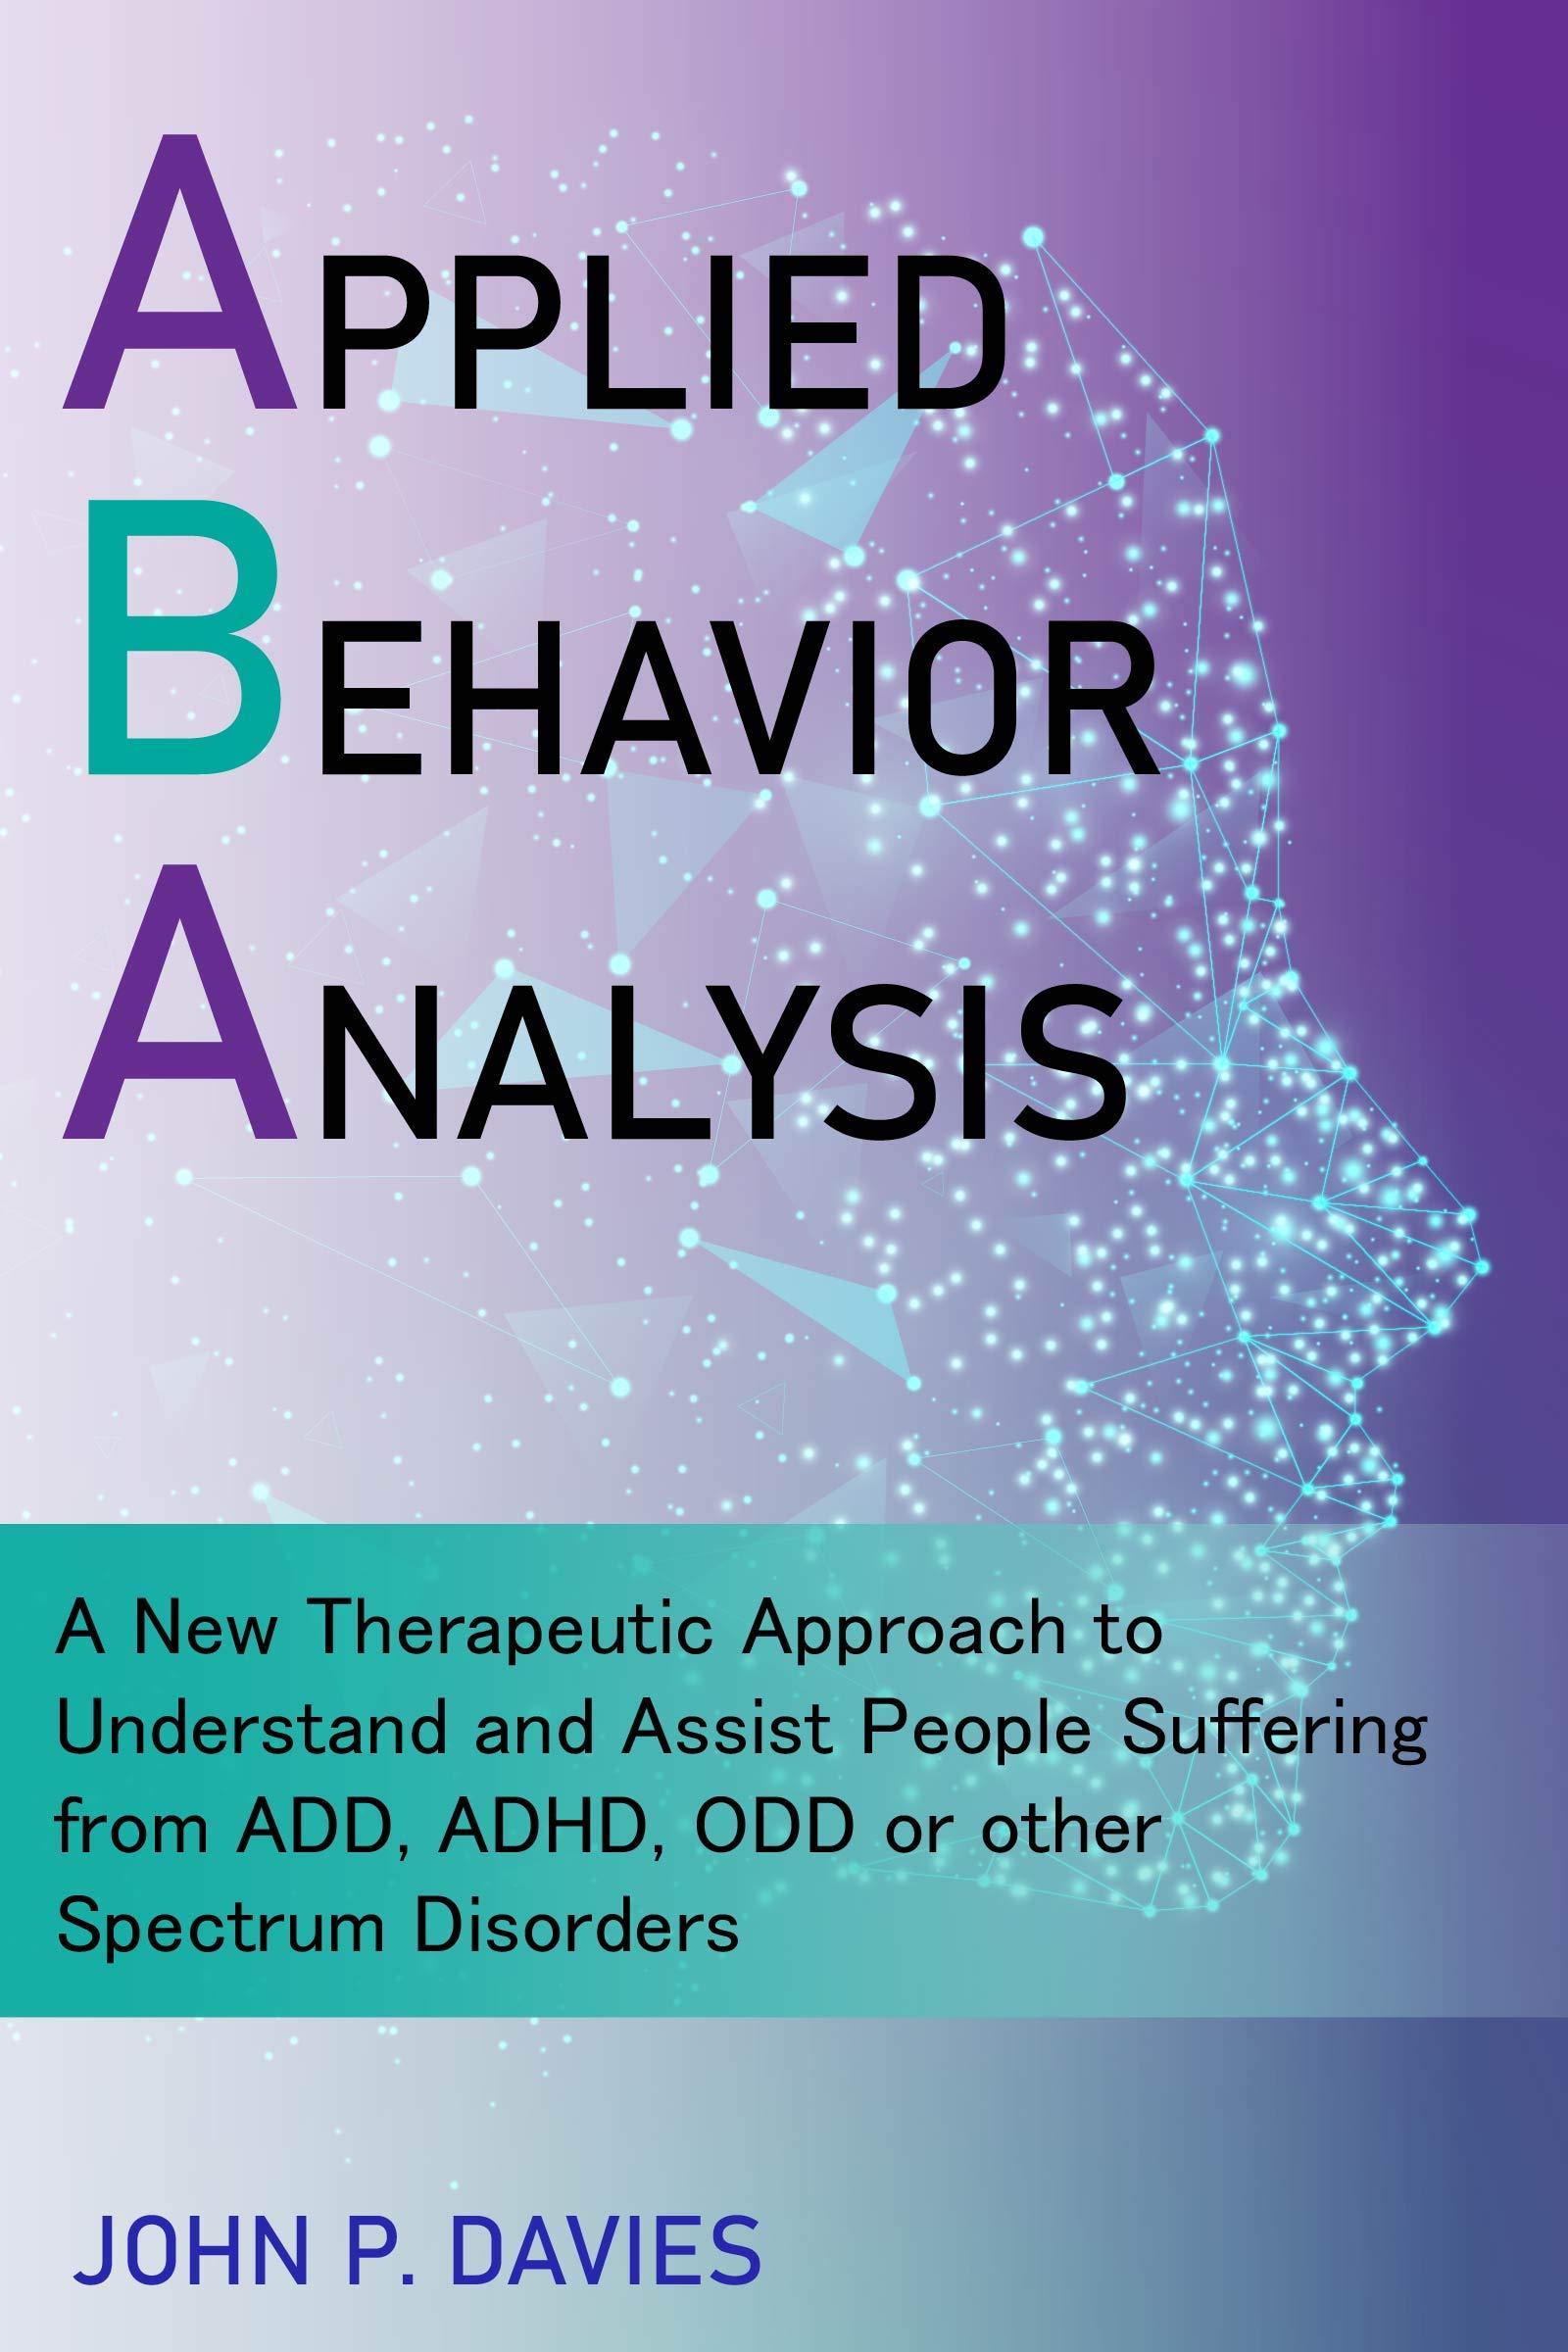 Applied Behavior Analysis John P. Davies